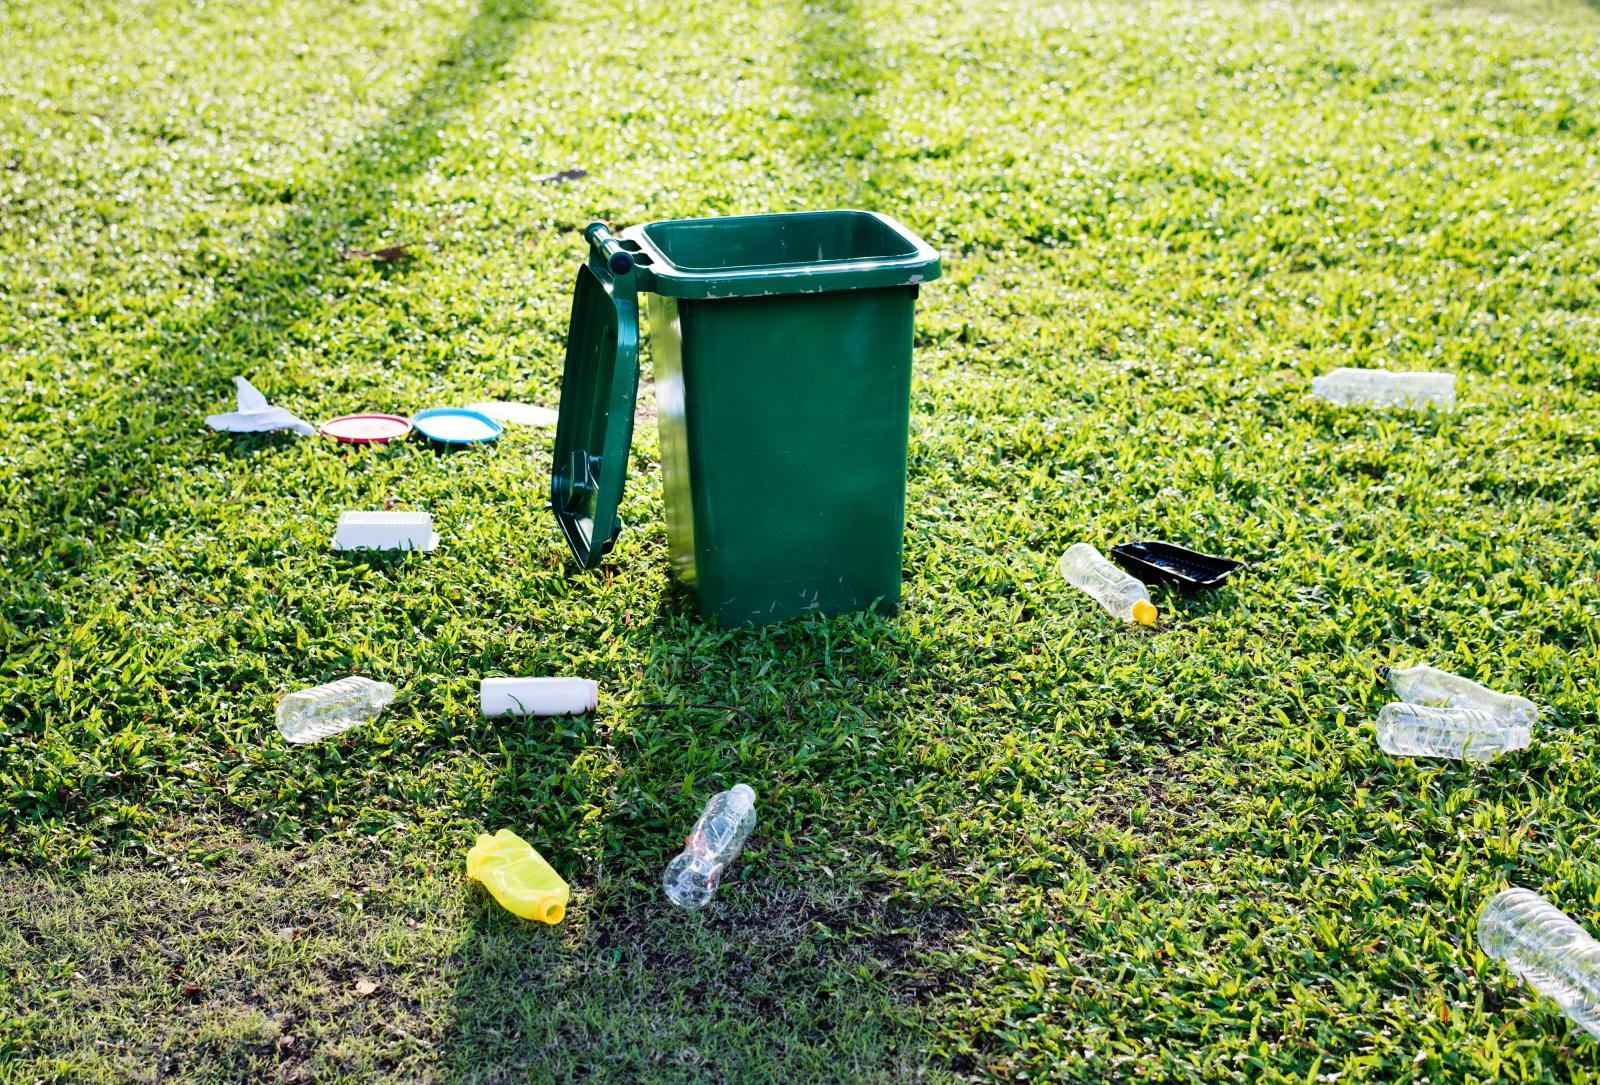 Plastic bottle litter. Photo credit: pexels